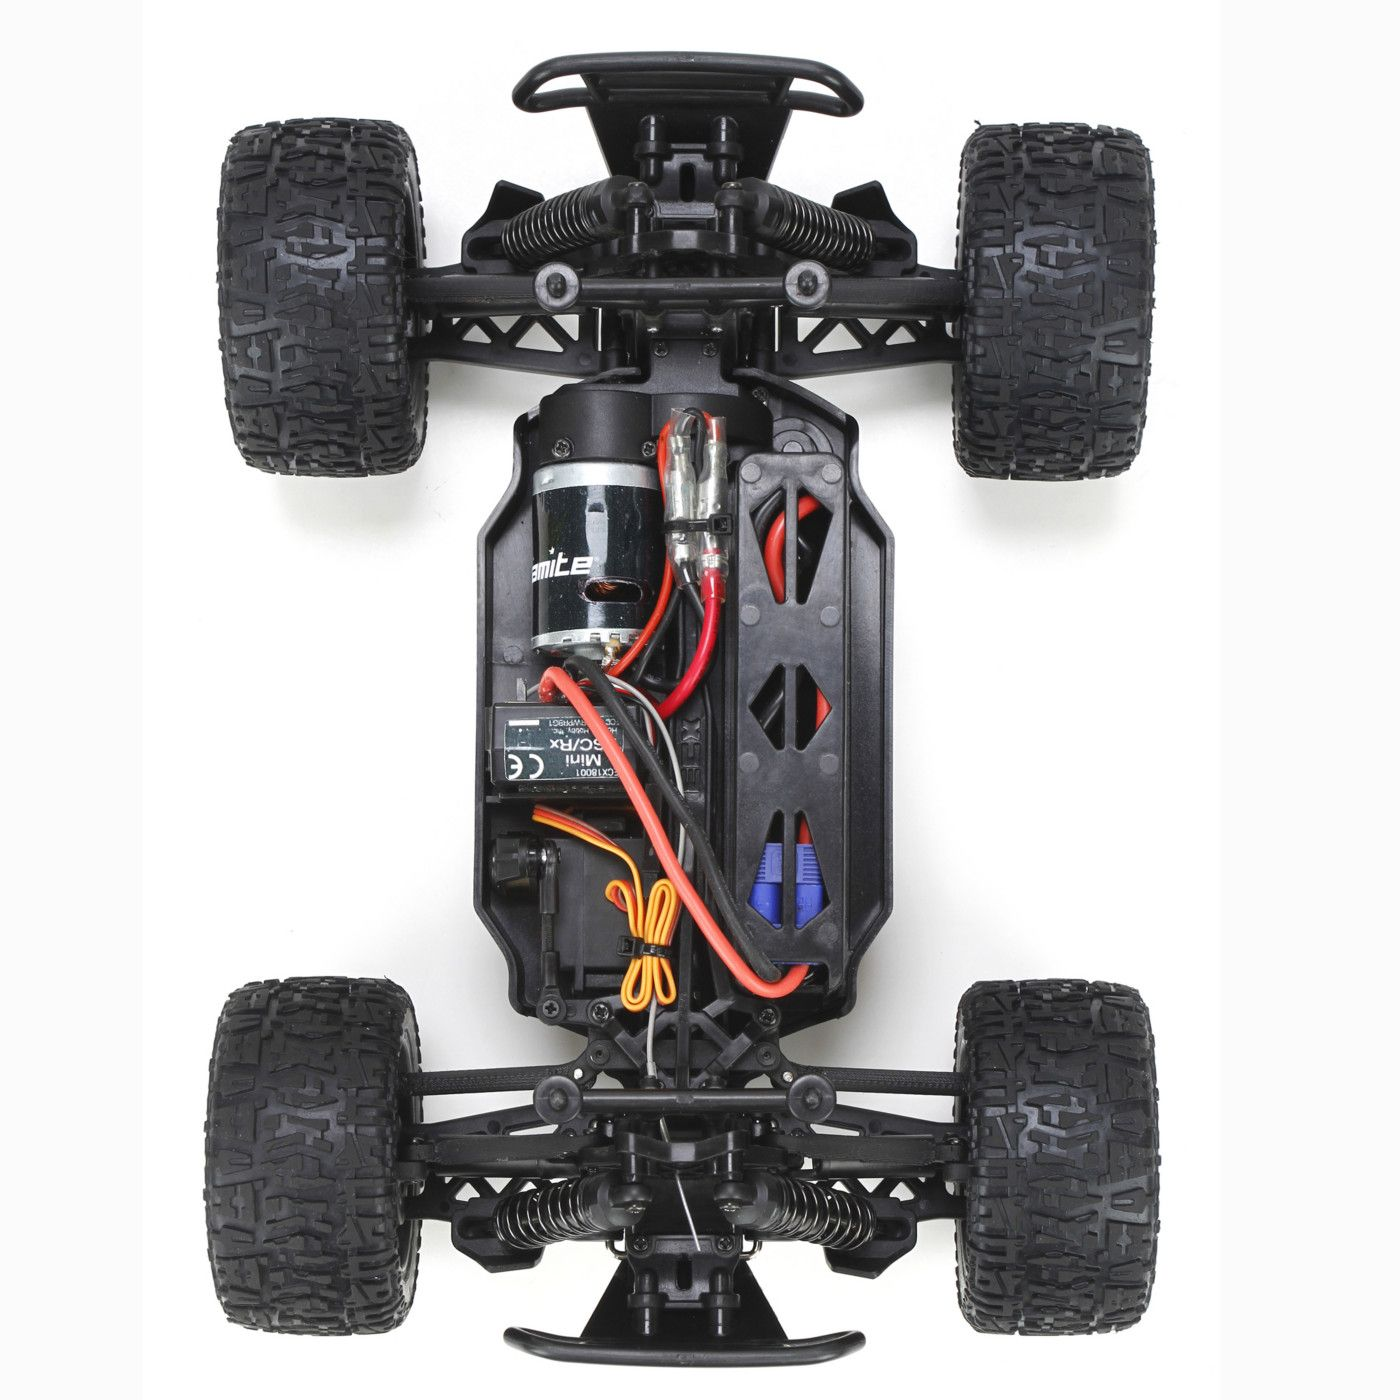 ecx ruckus monster truck 4wd rc rtr 02